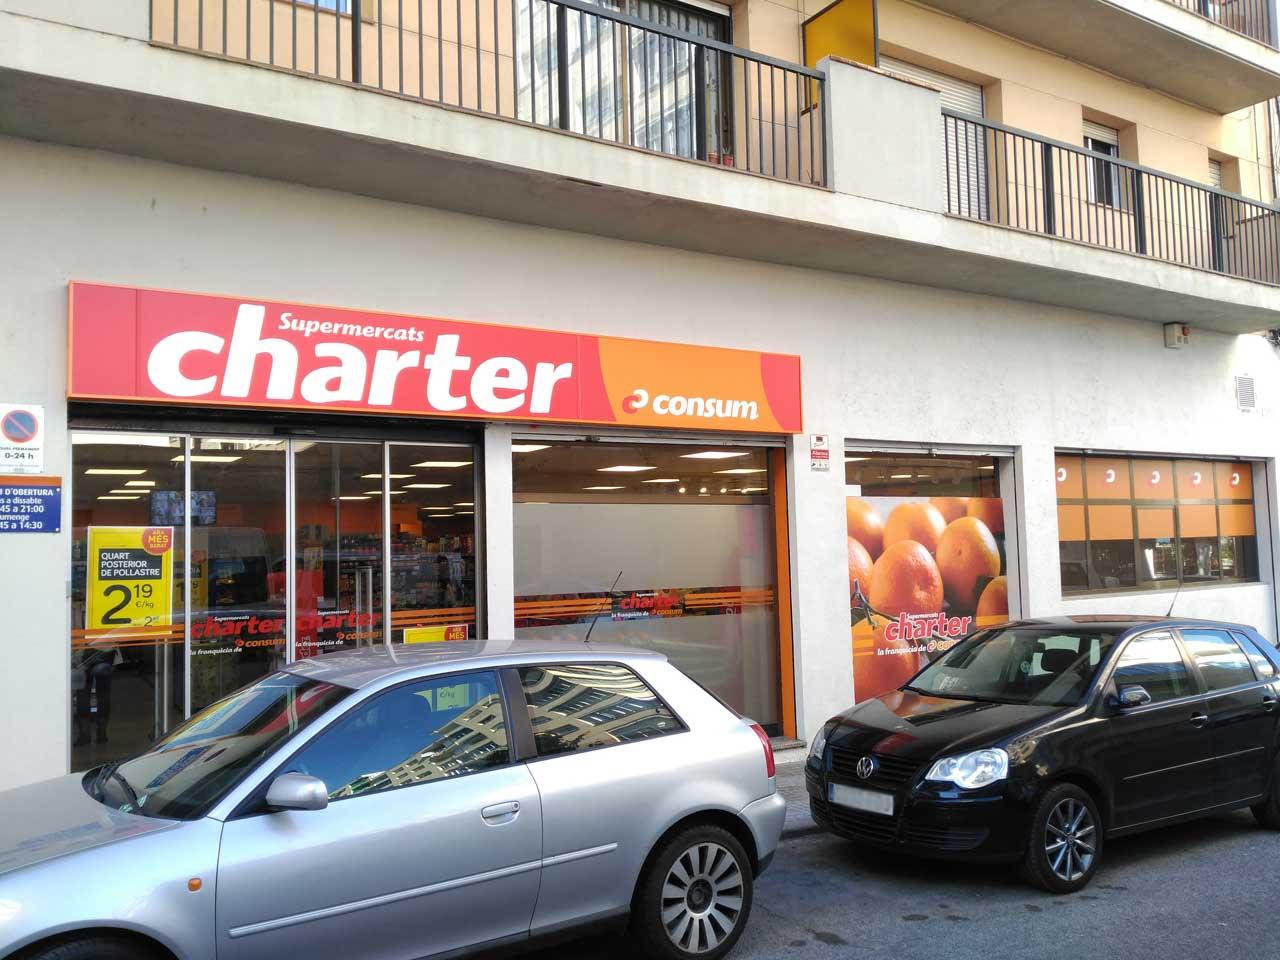 Supermercado Consum Charter en Granollers